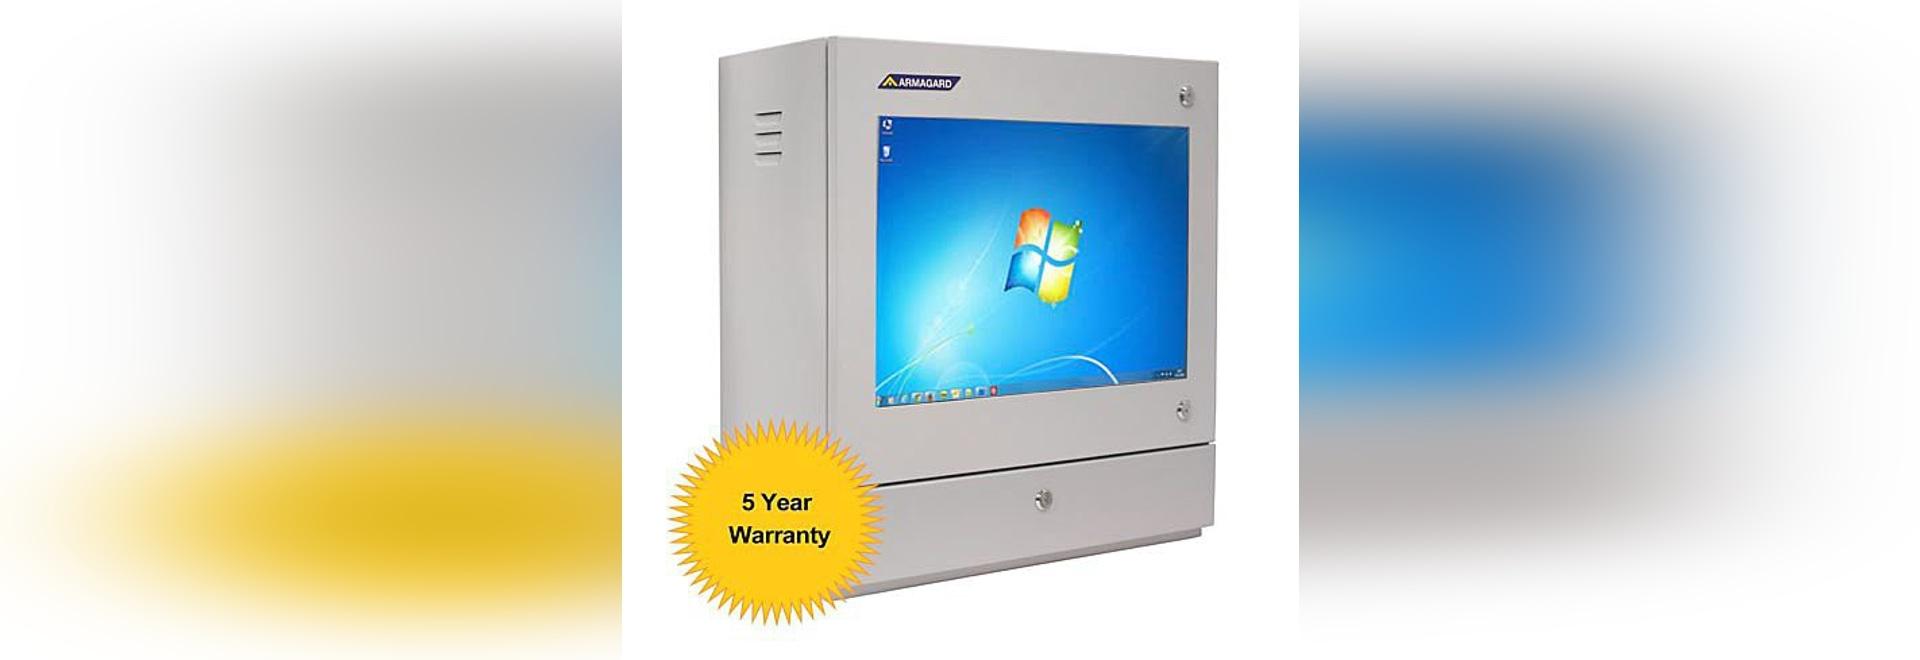 PENC-400 Widescreen PC Enclosure – Saving You Money on IT Equipment Repair